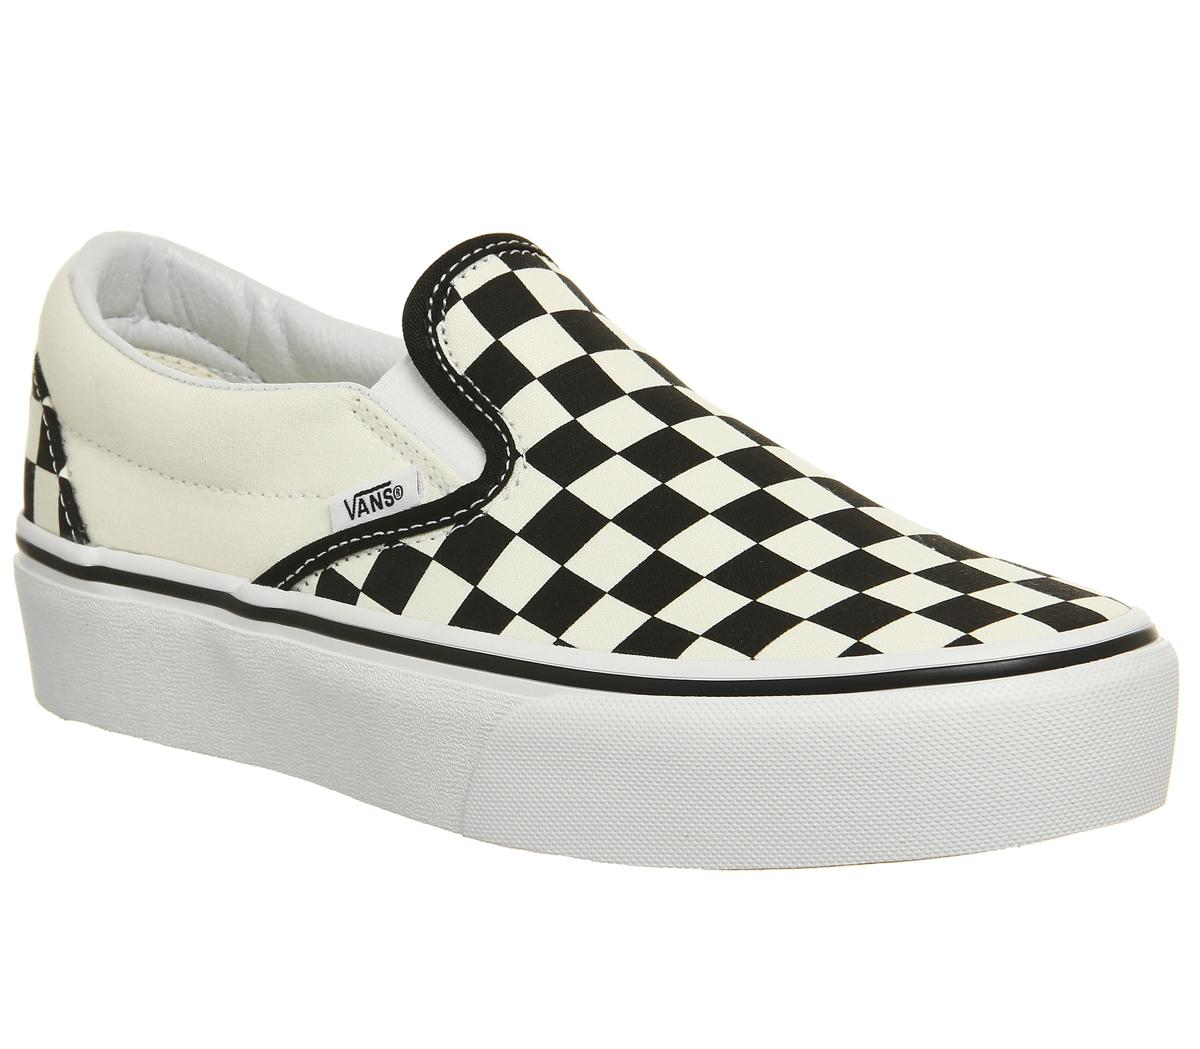 checkered vans white and black